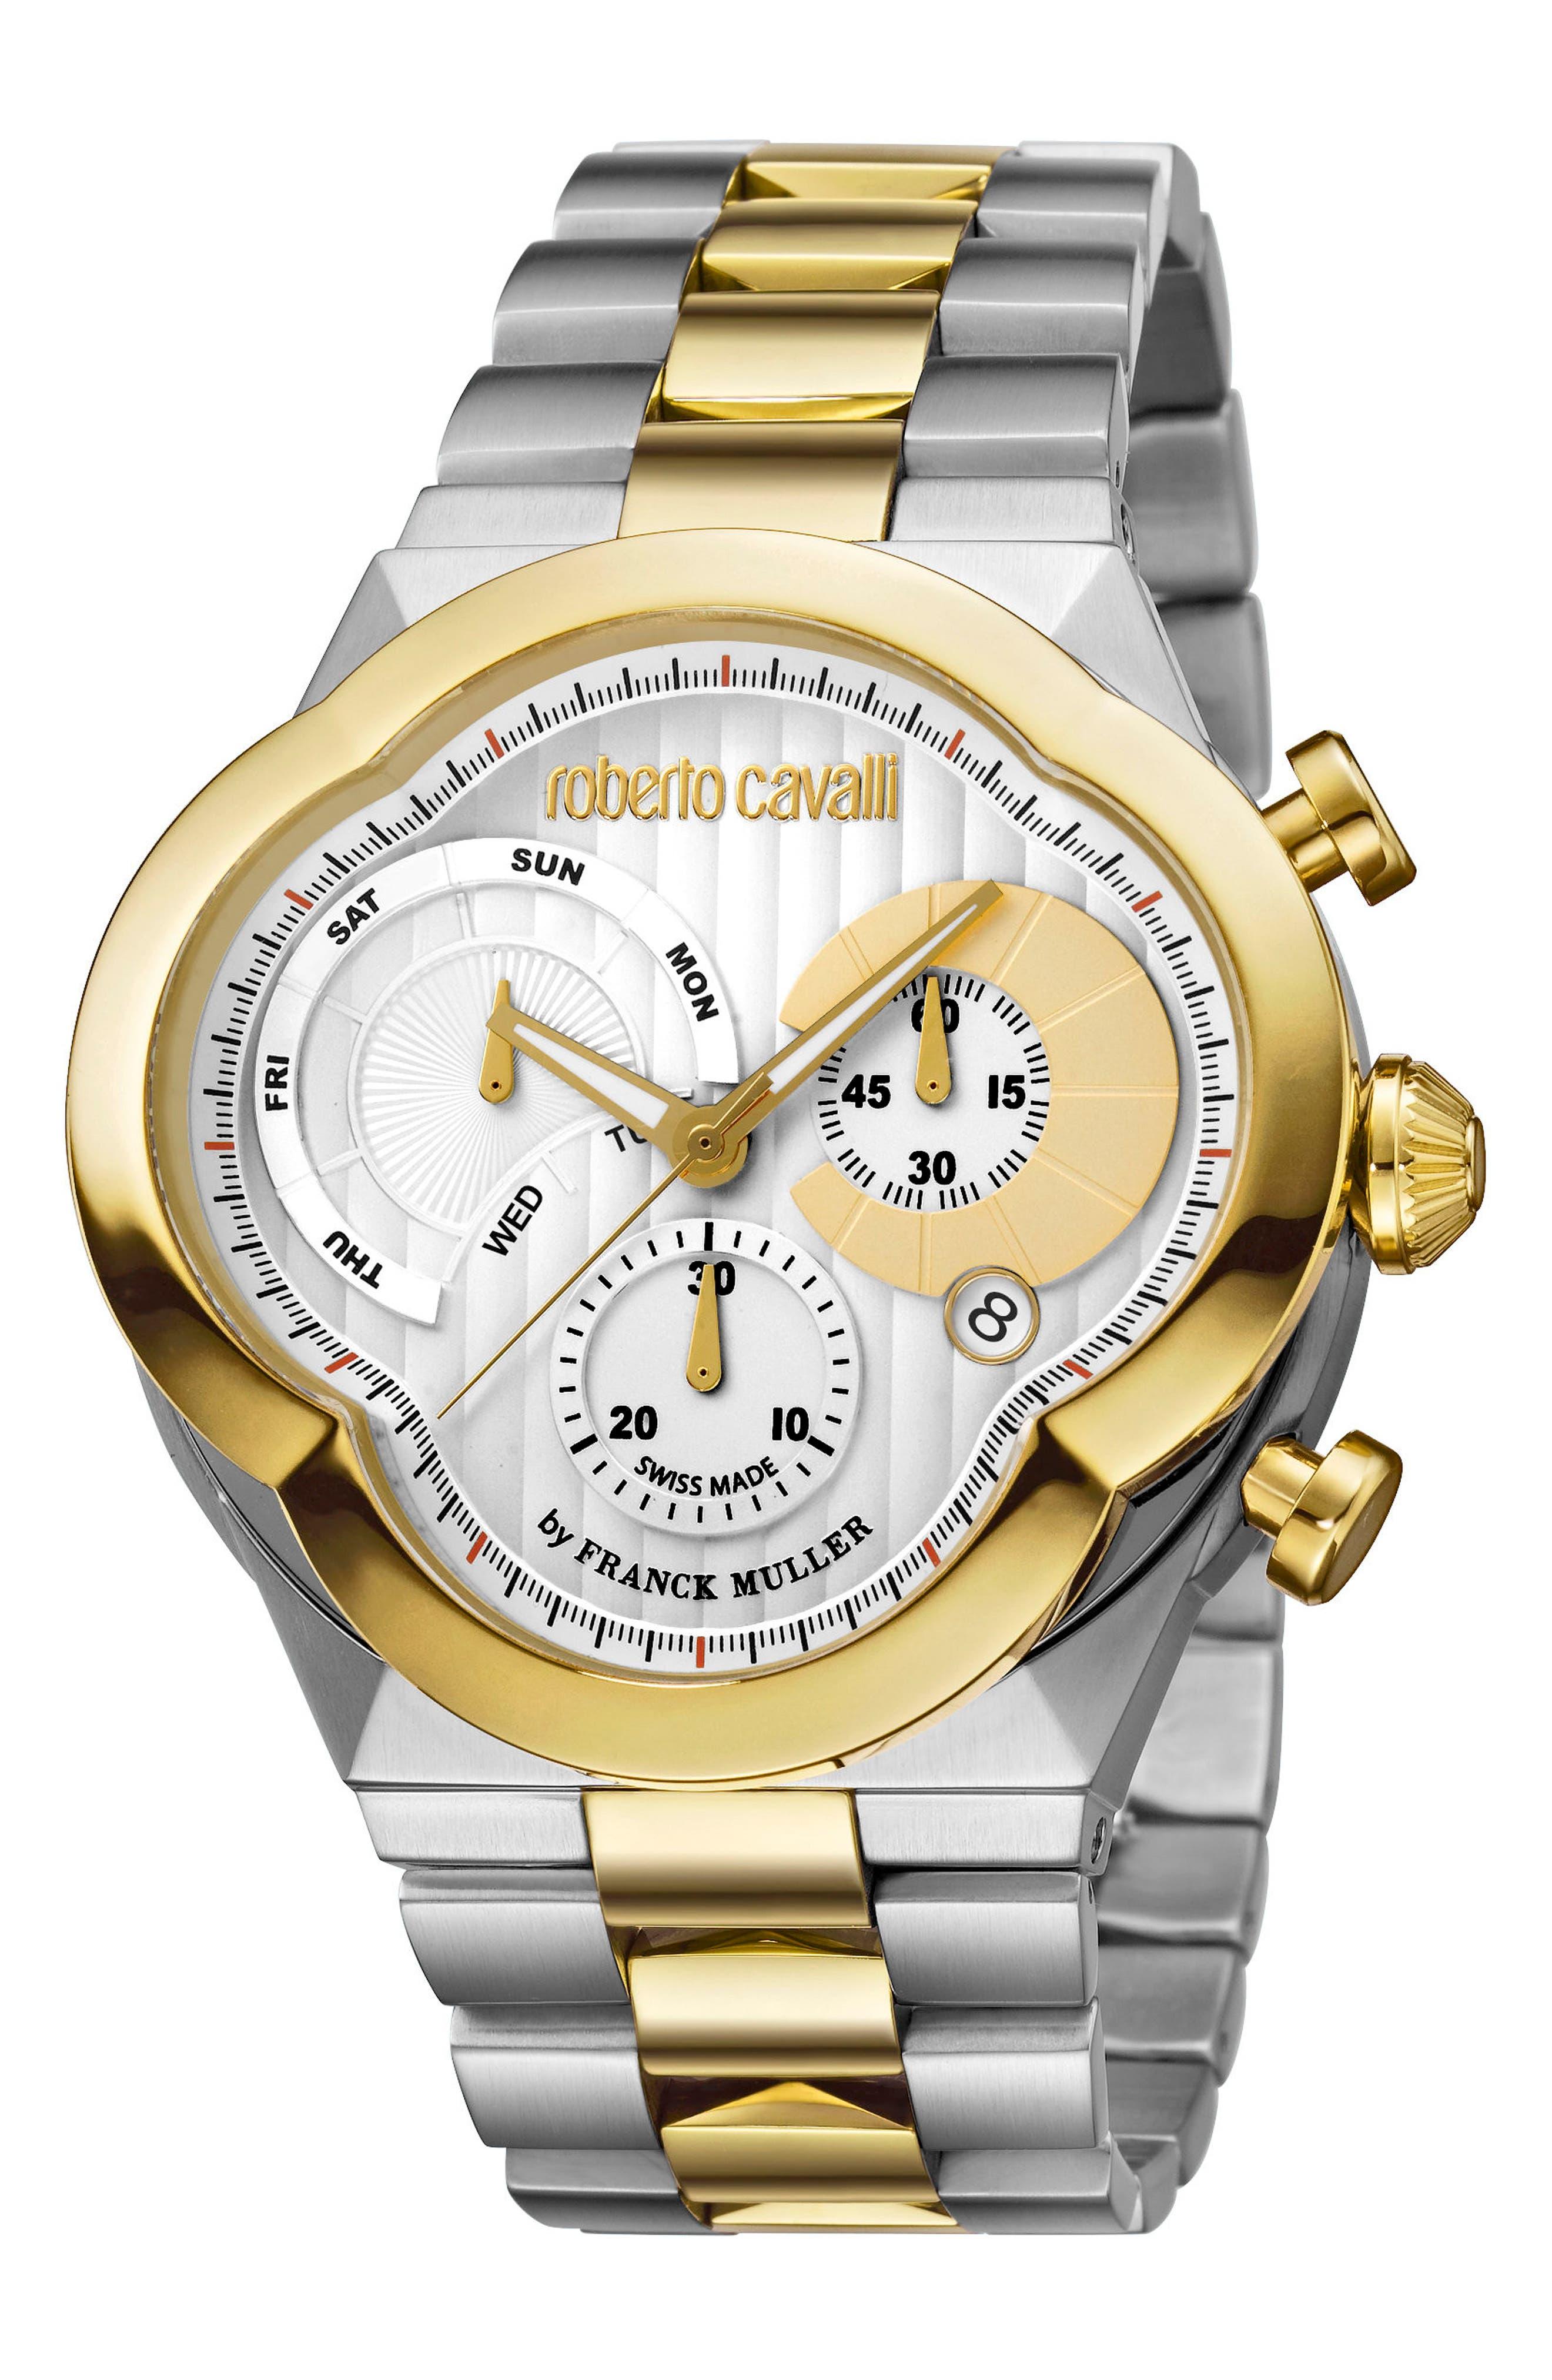 Main Image - Roberto Cavalli by Franck Muller Clover Chronograph Bracelet Watch, 47mm